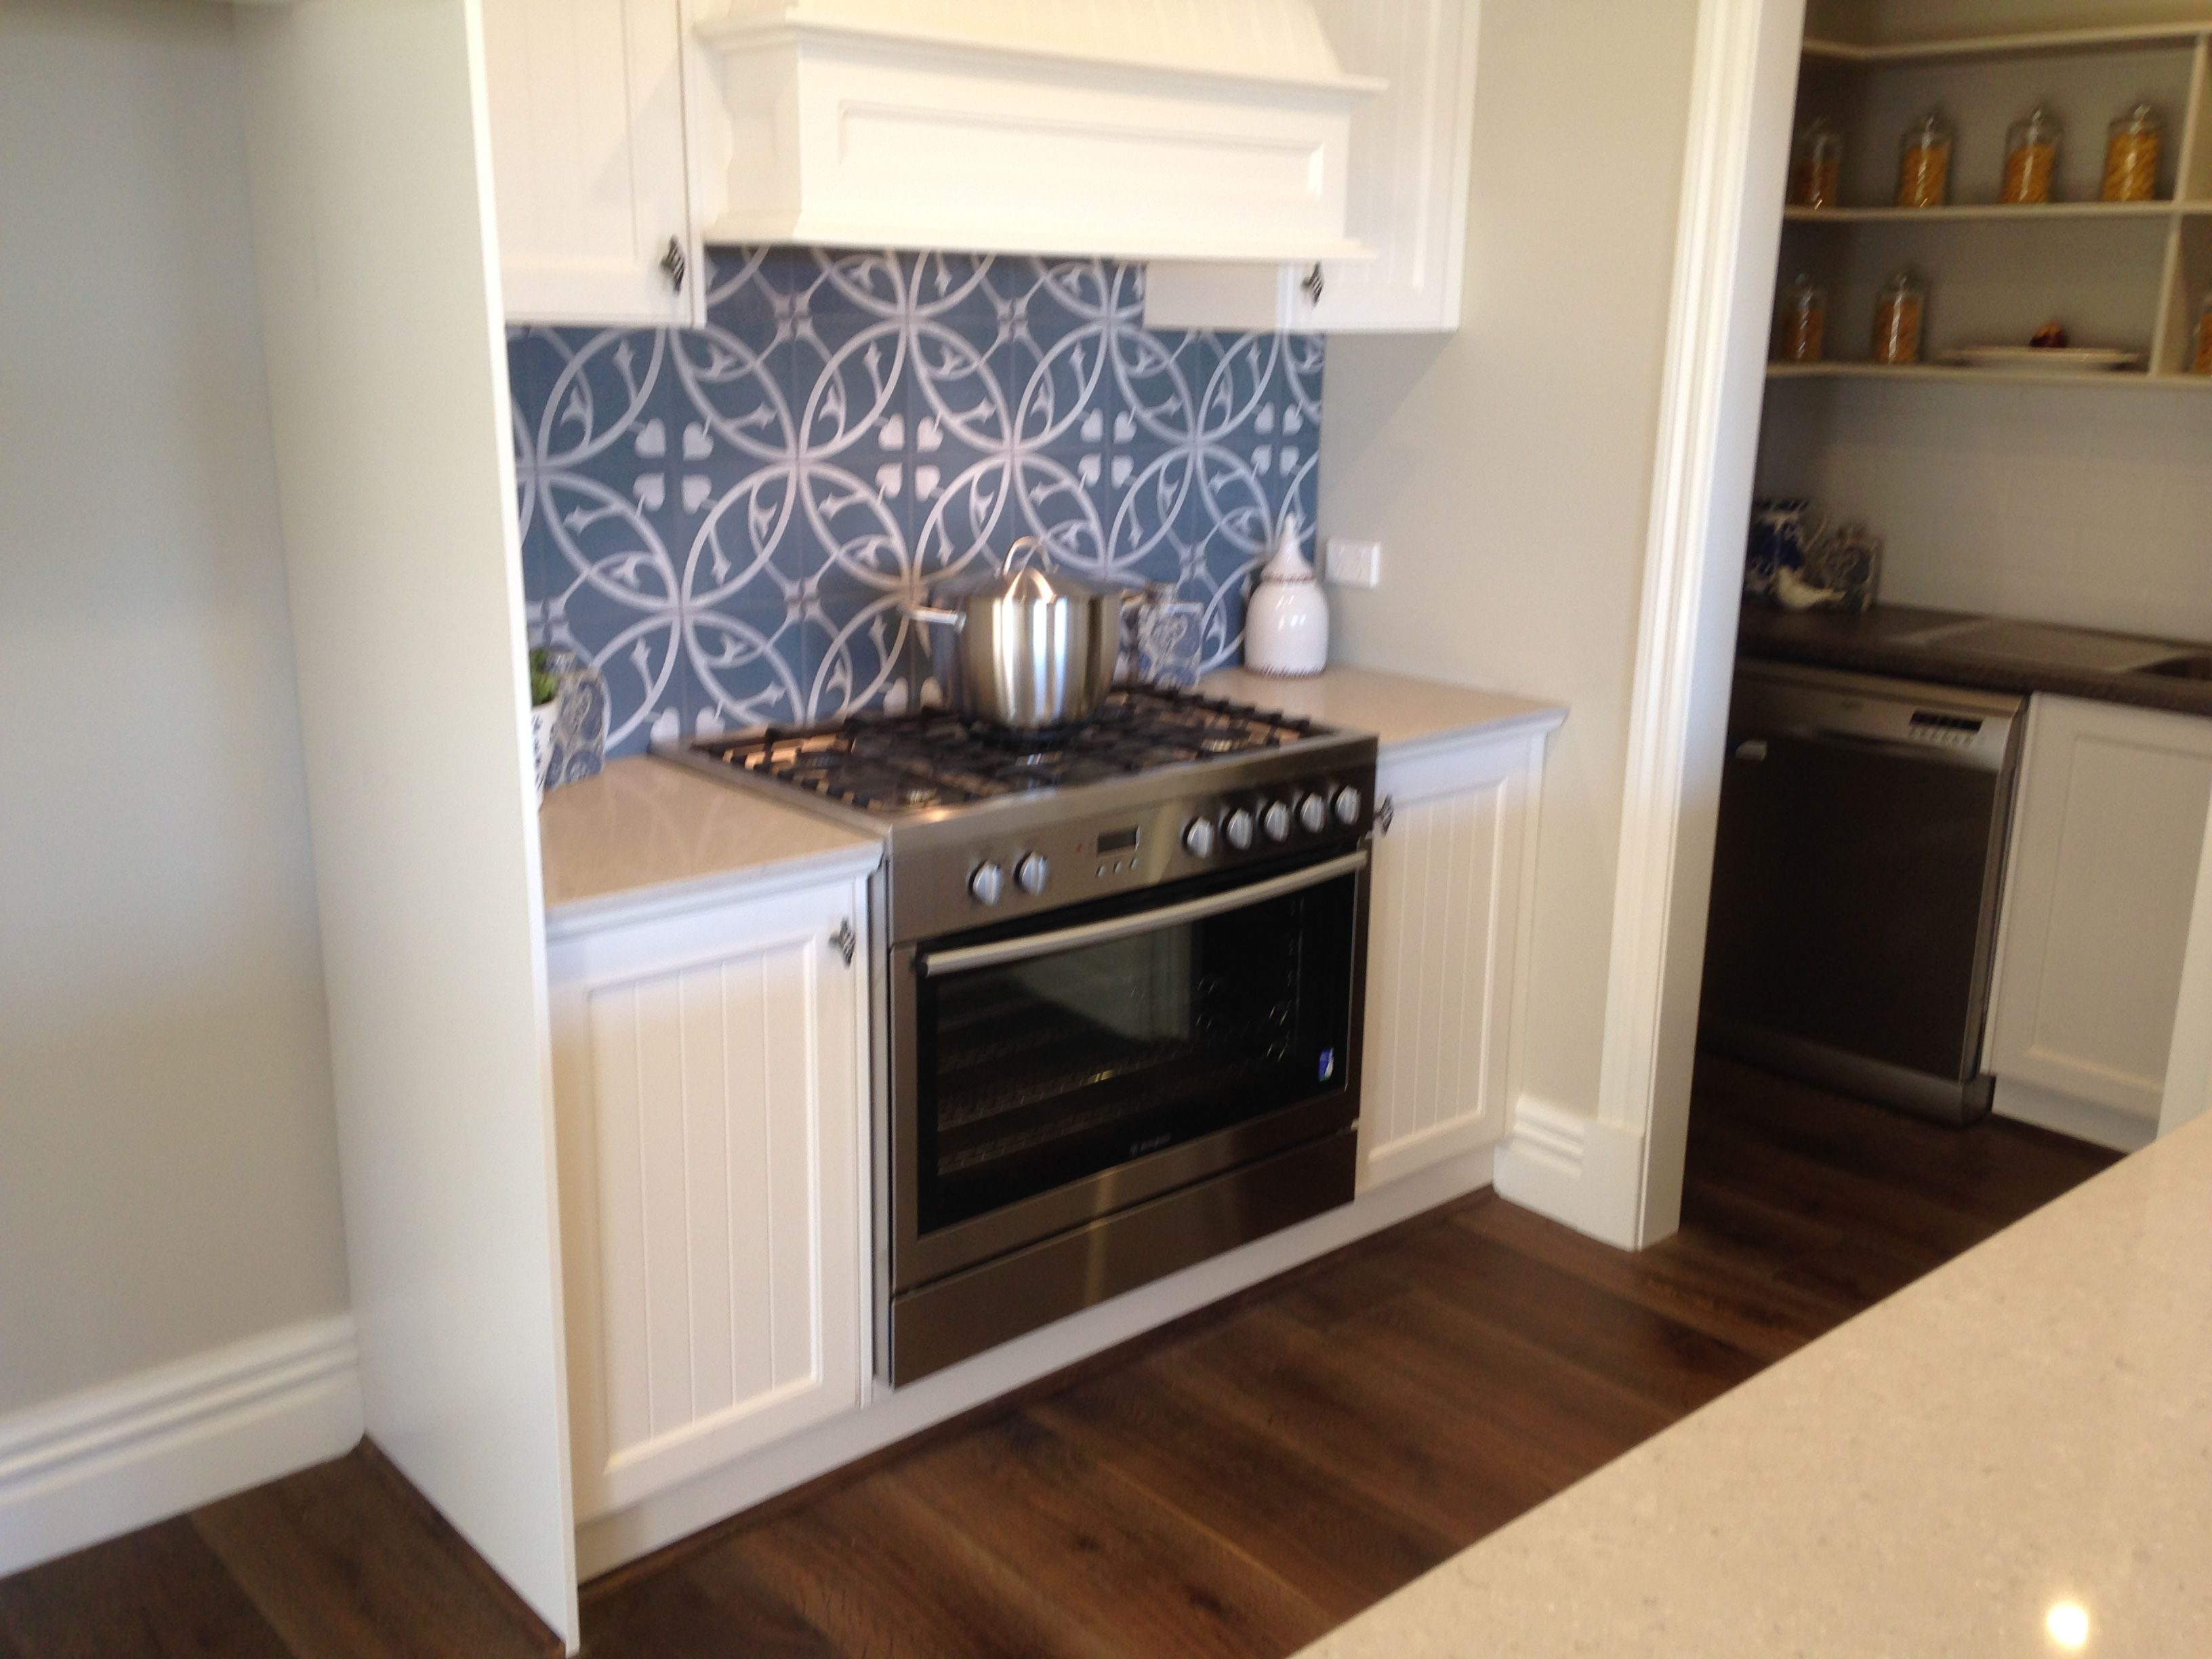 hampton kitchen 900mm free standing oven with built in range hood